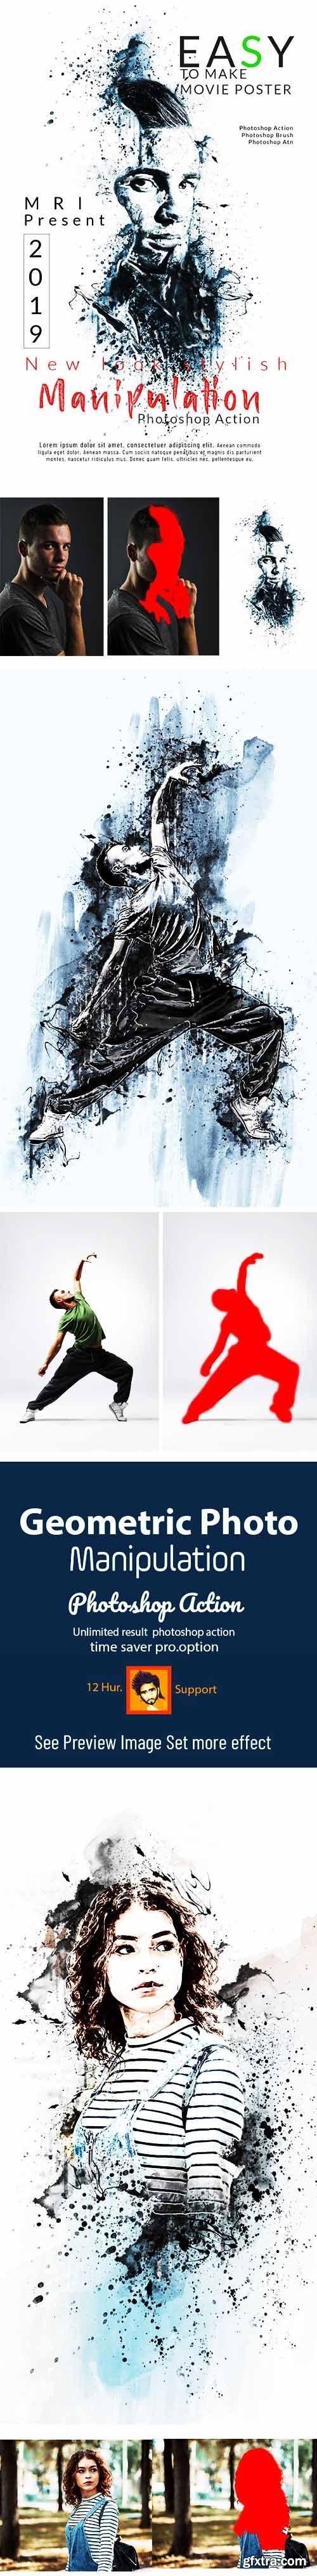 Graphicriver Ink Manipulation Photoshop Action 23025536